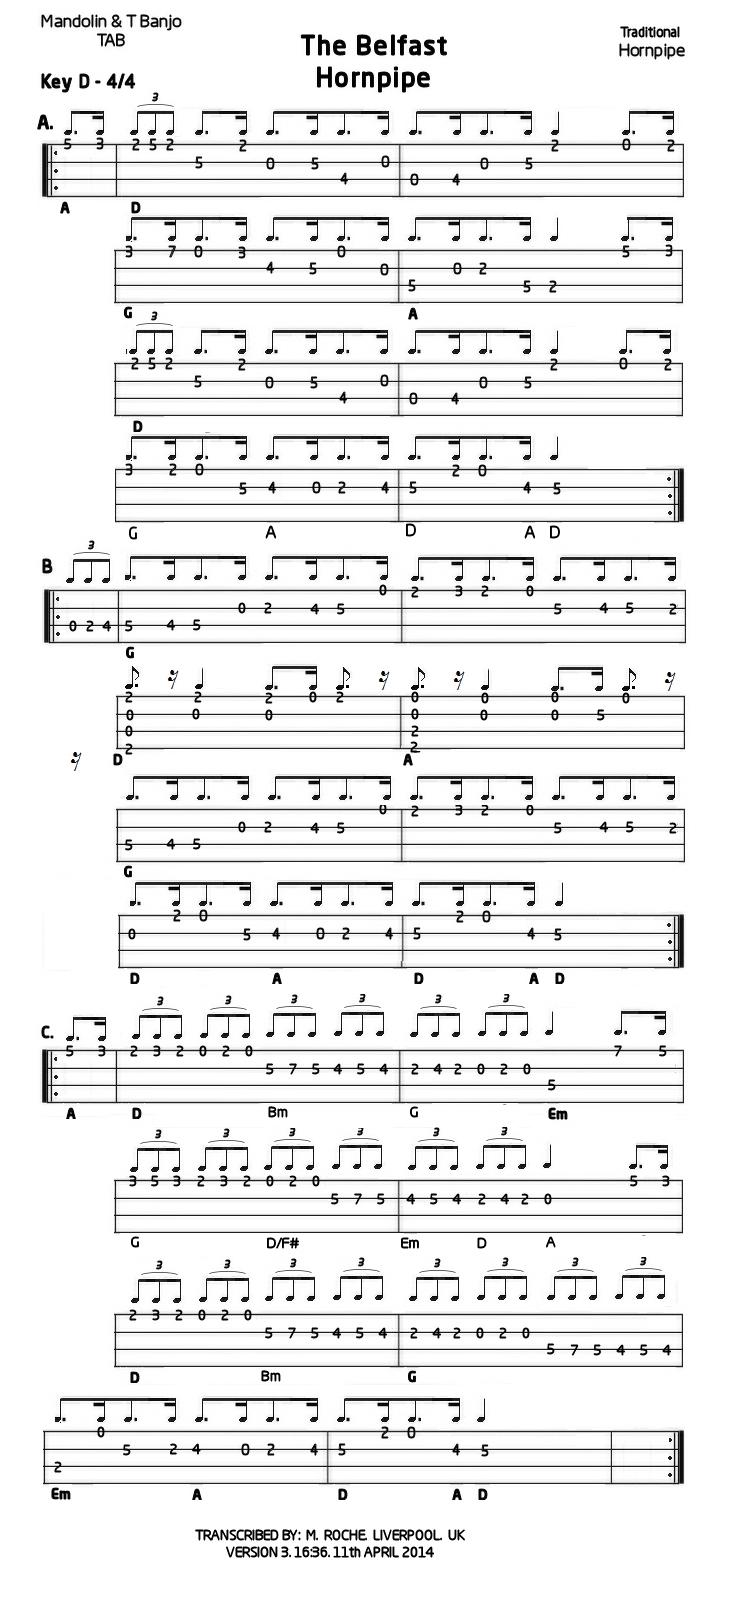 Belfast hornpipe mandolin gdae tab 200 tunes so far belfast hornpipe v3 11 4 2014 hexwebz Choice Image